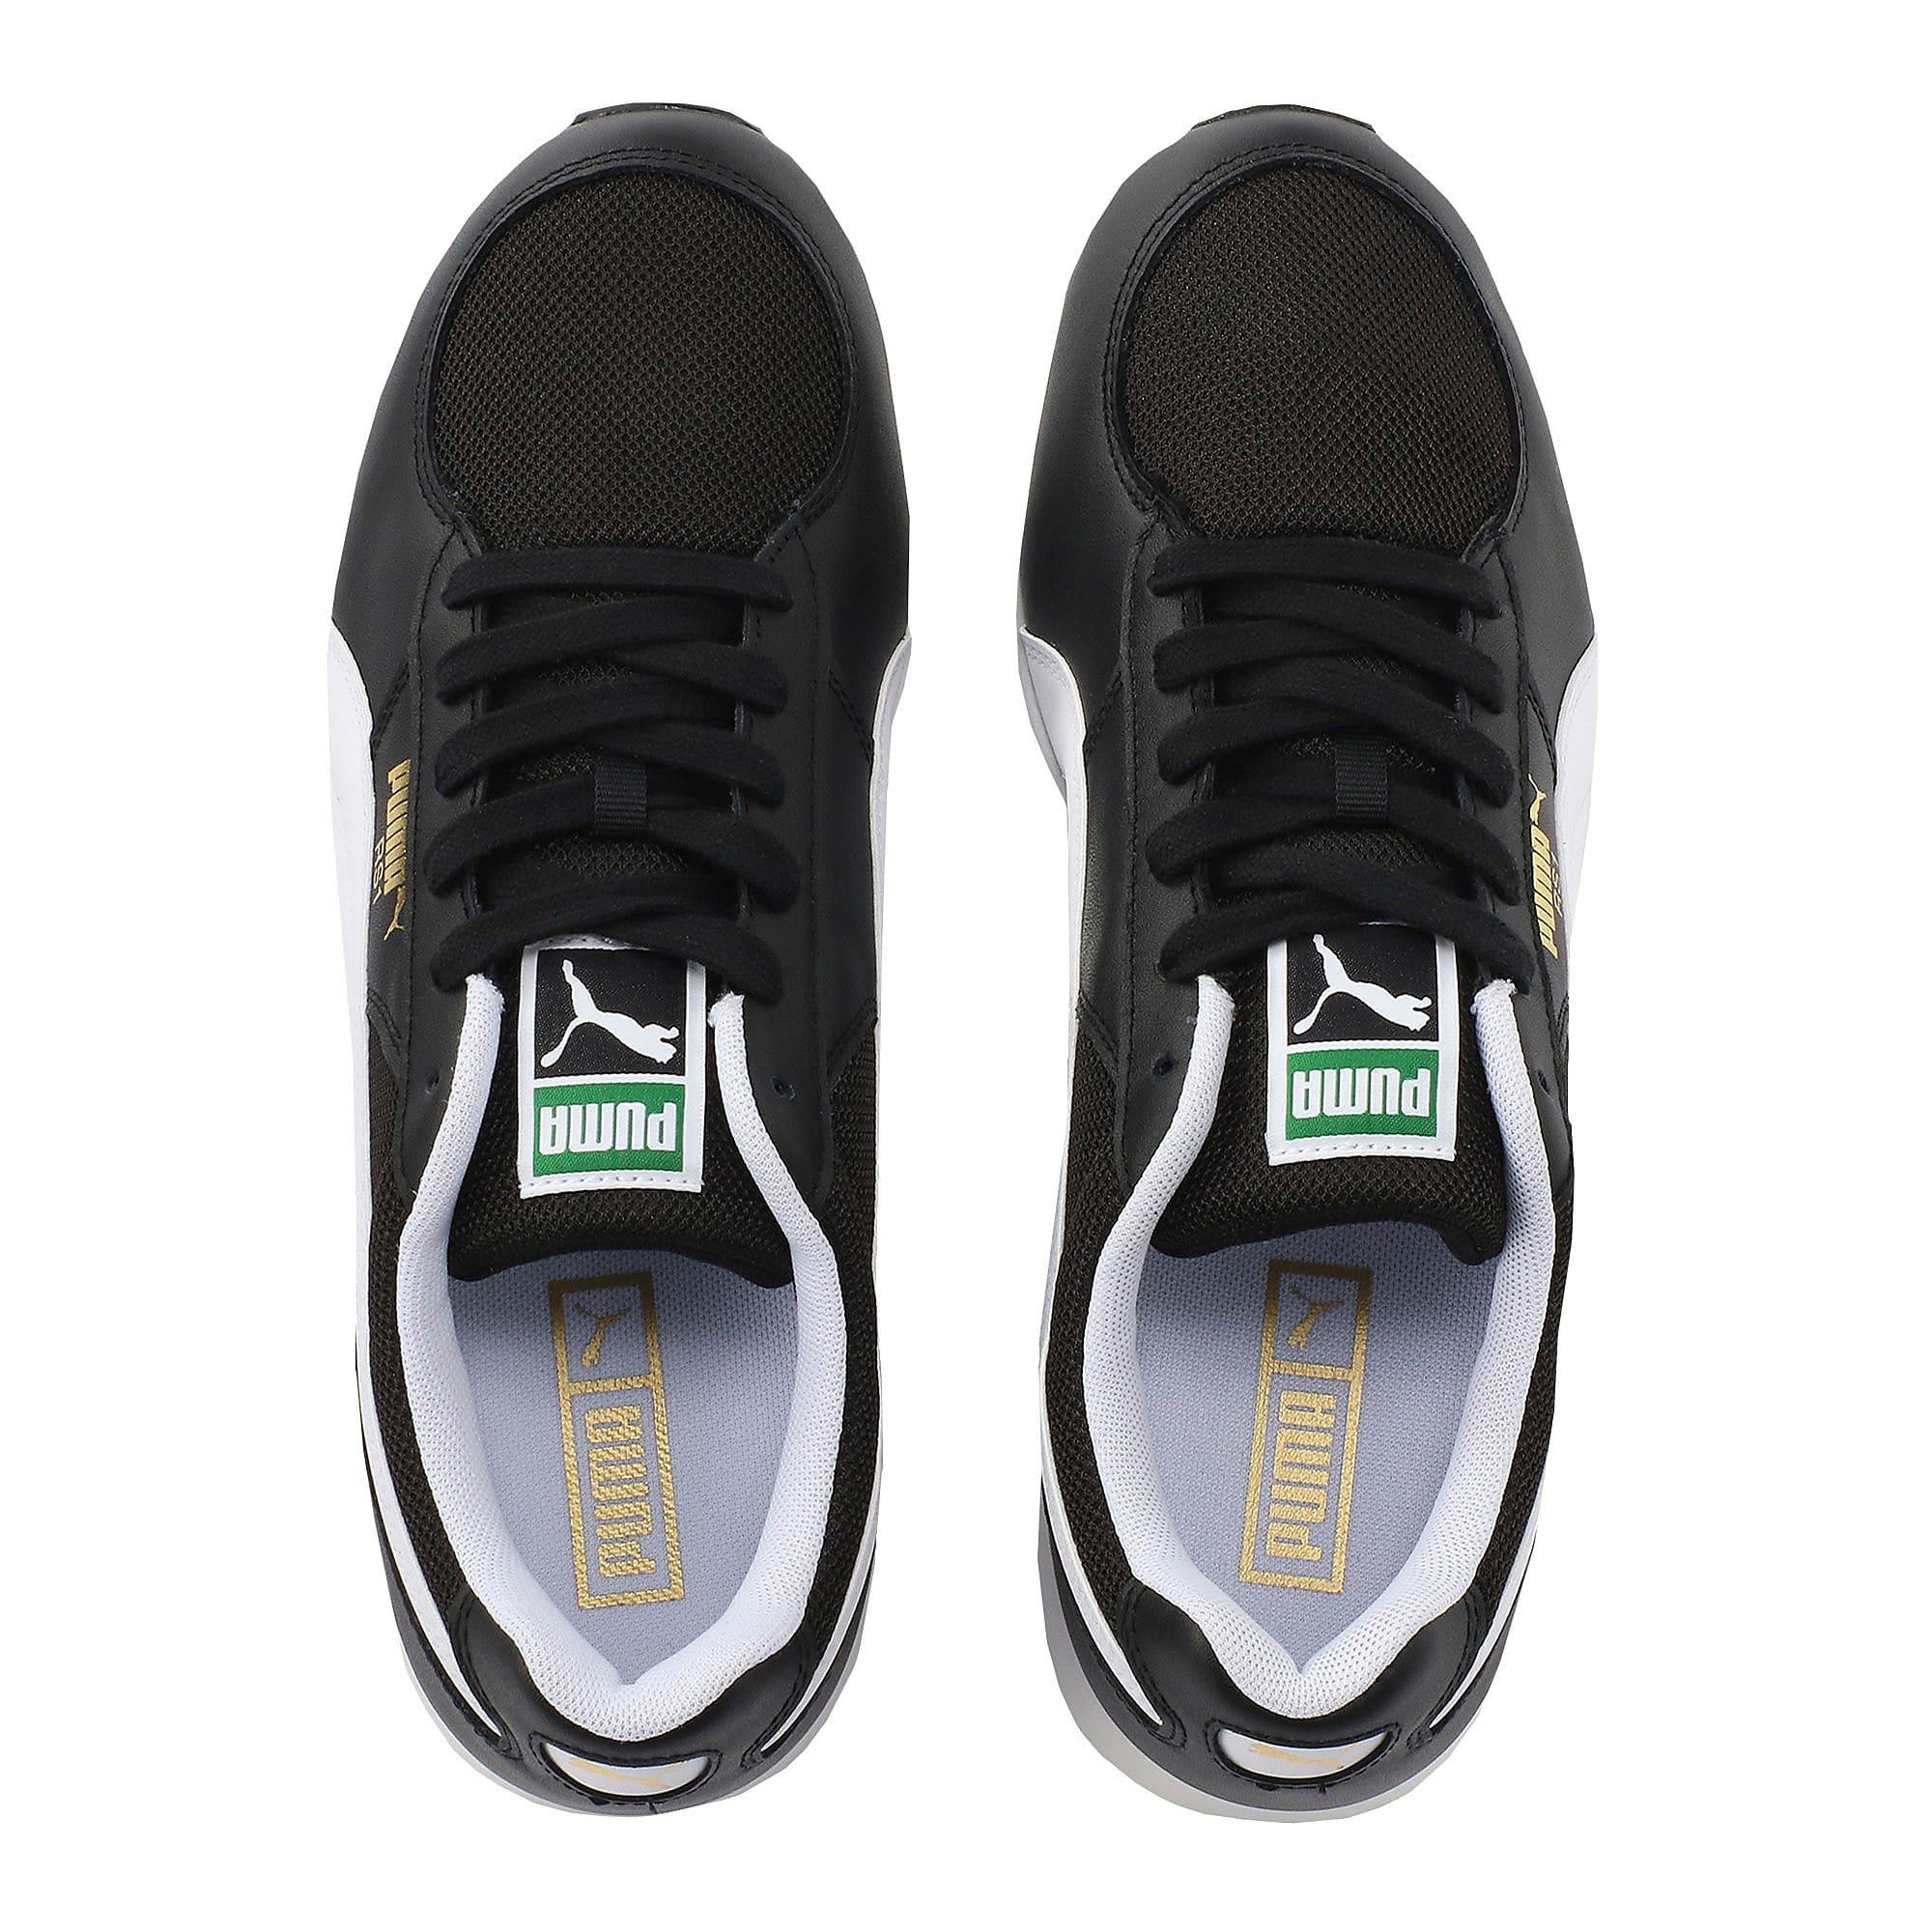 Thumbnail 6 of RS-1 OG CLONE Sneakers, Puma Black-CASTLEROCK, medium